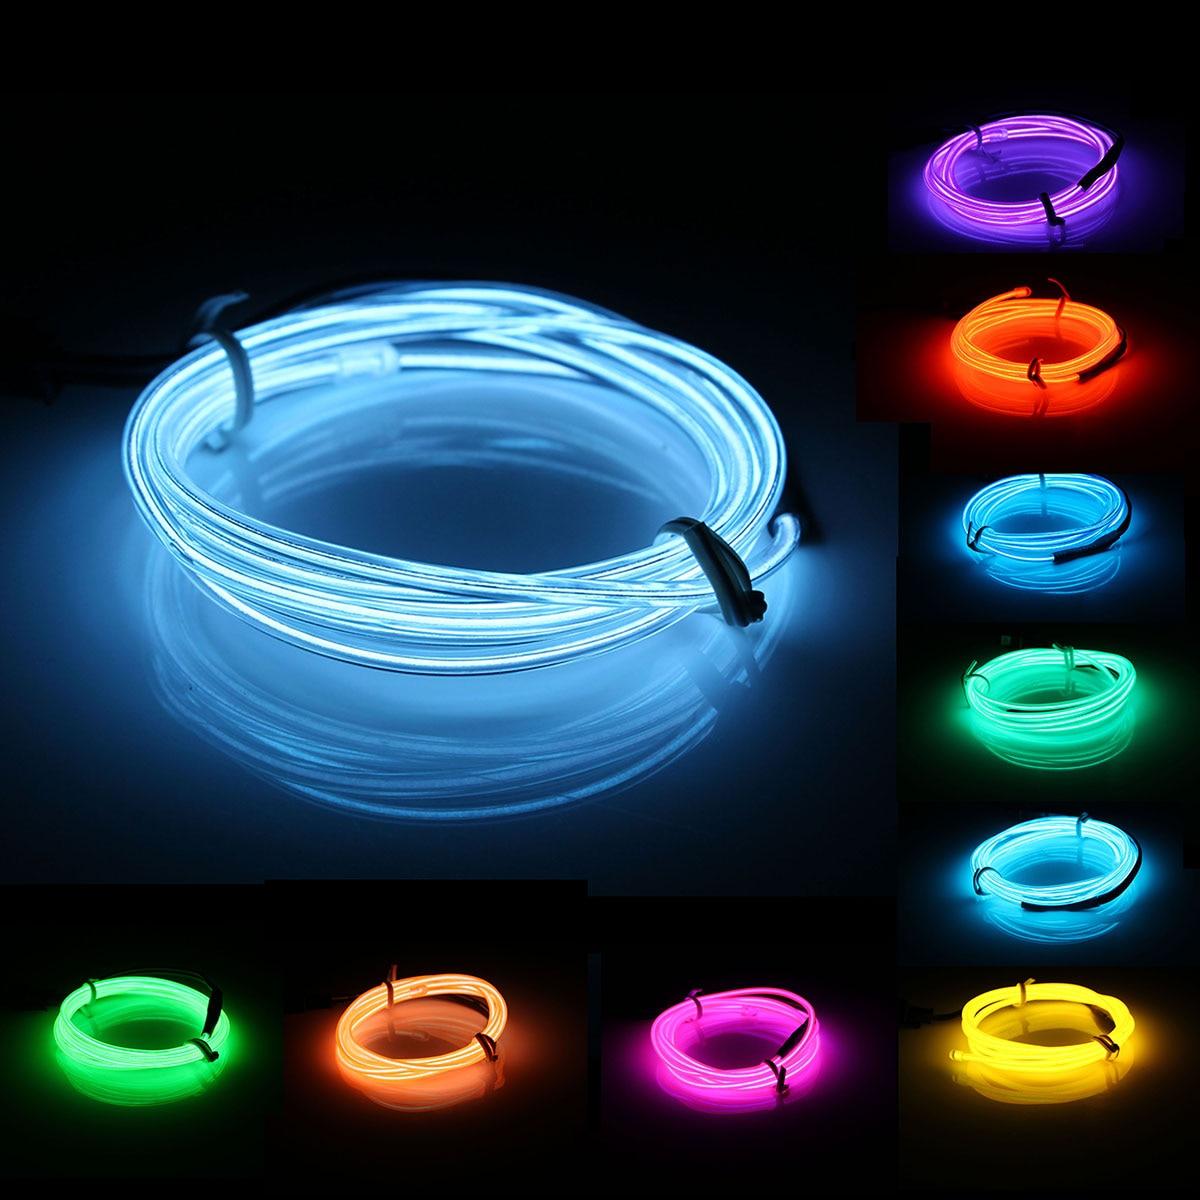 Smuxi 1M EL LED EL Wire LED Strip DC 12V Flexible Soft Tube Wire Neon Glow Car Rope 10 Colors Light Party Christmas Decoration